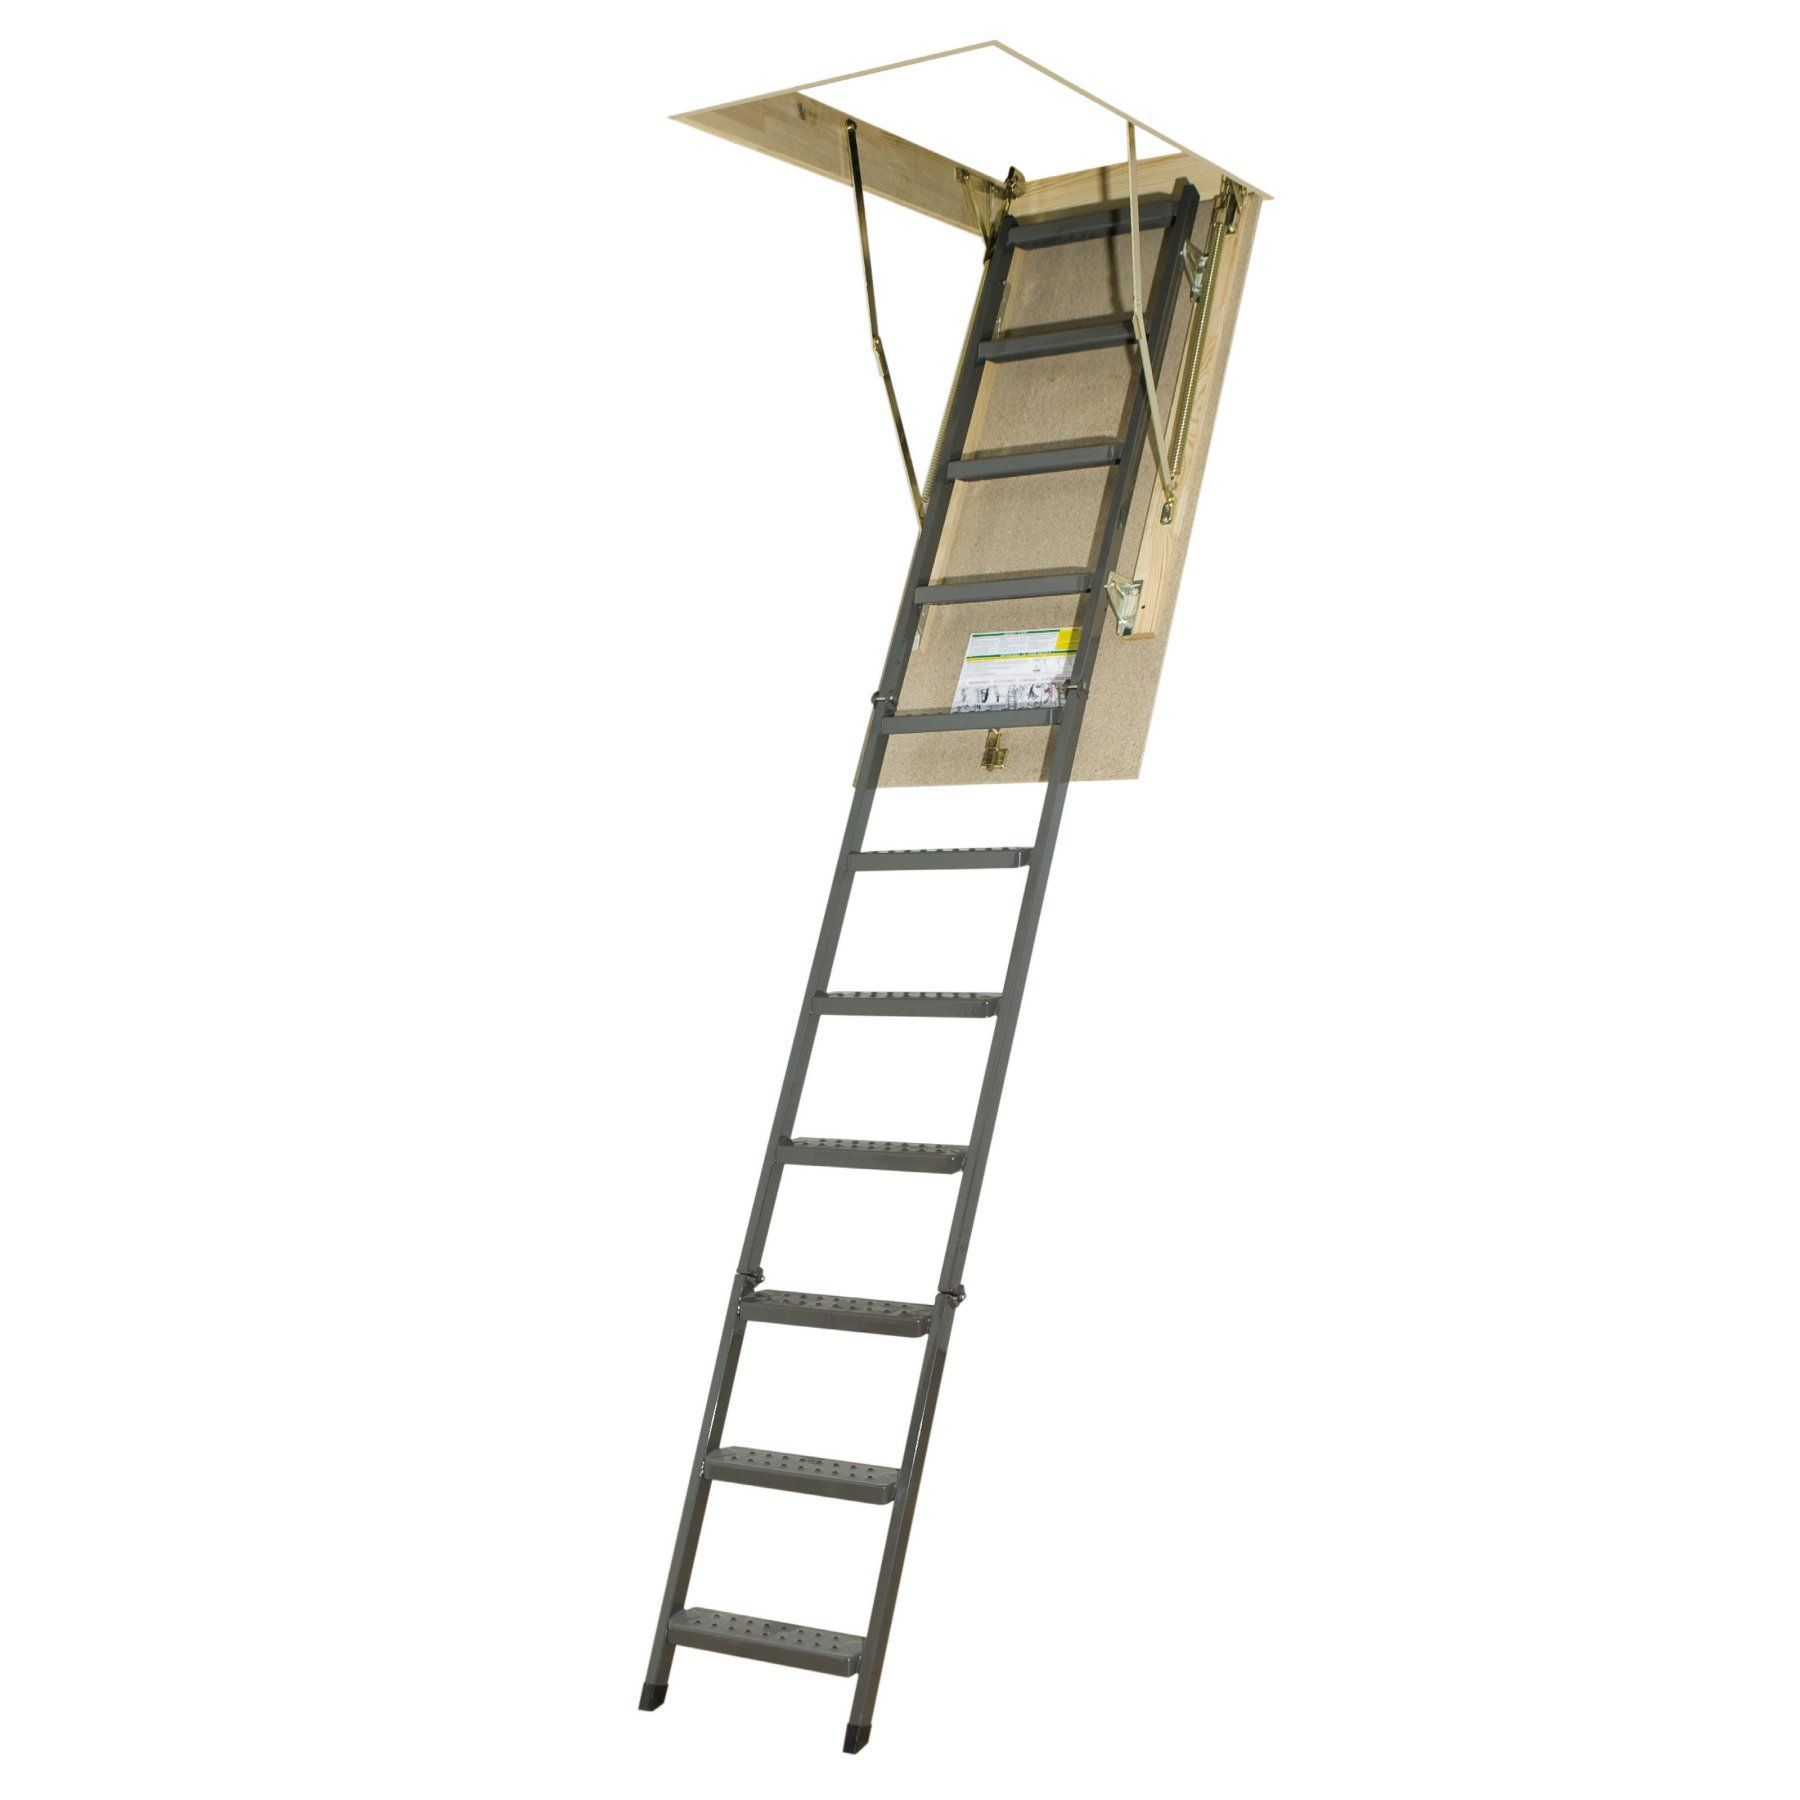 Fakro 101 ft steel attic ladder 66862 attic ladder